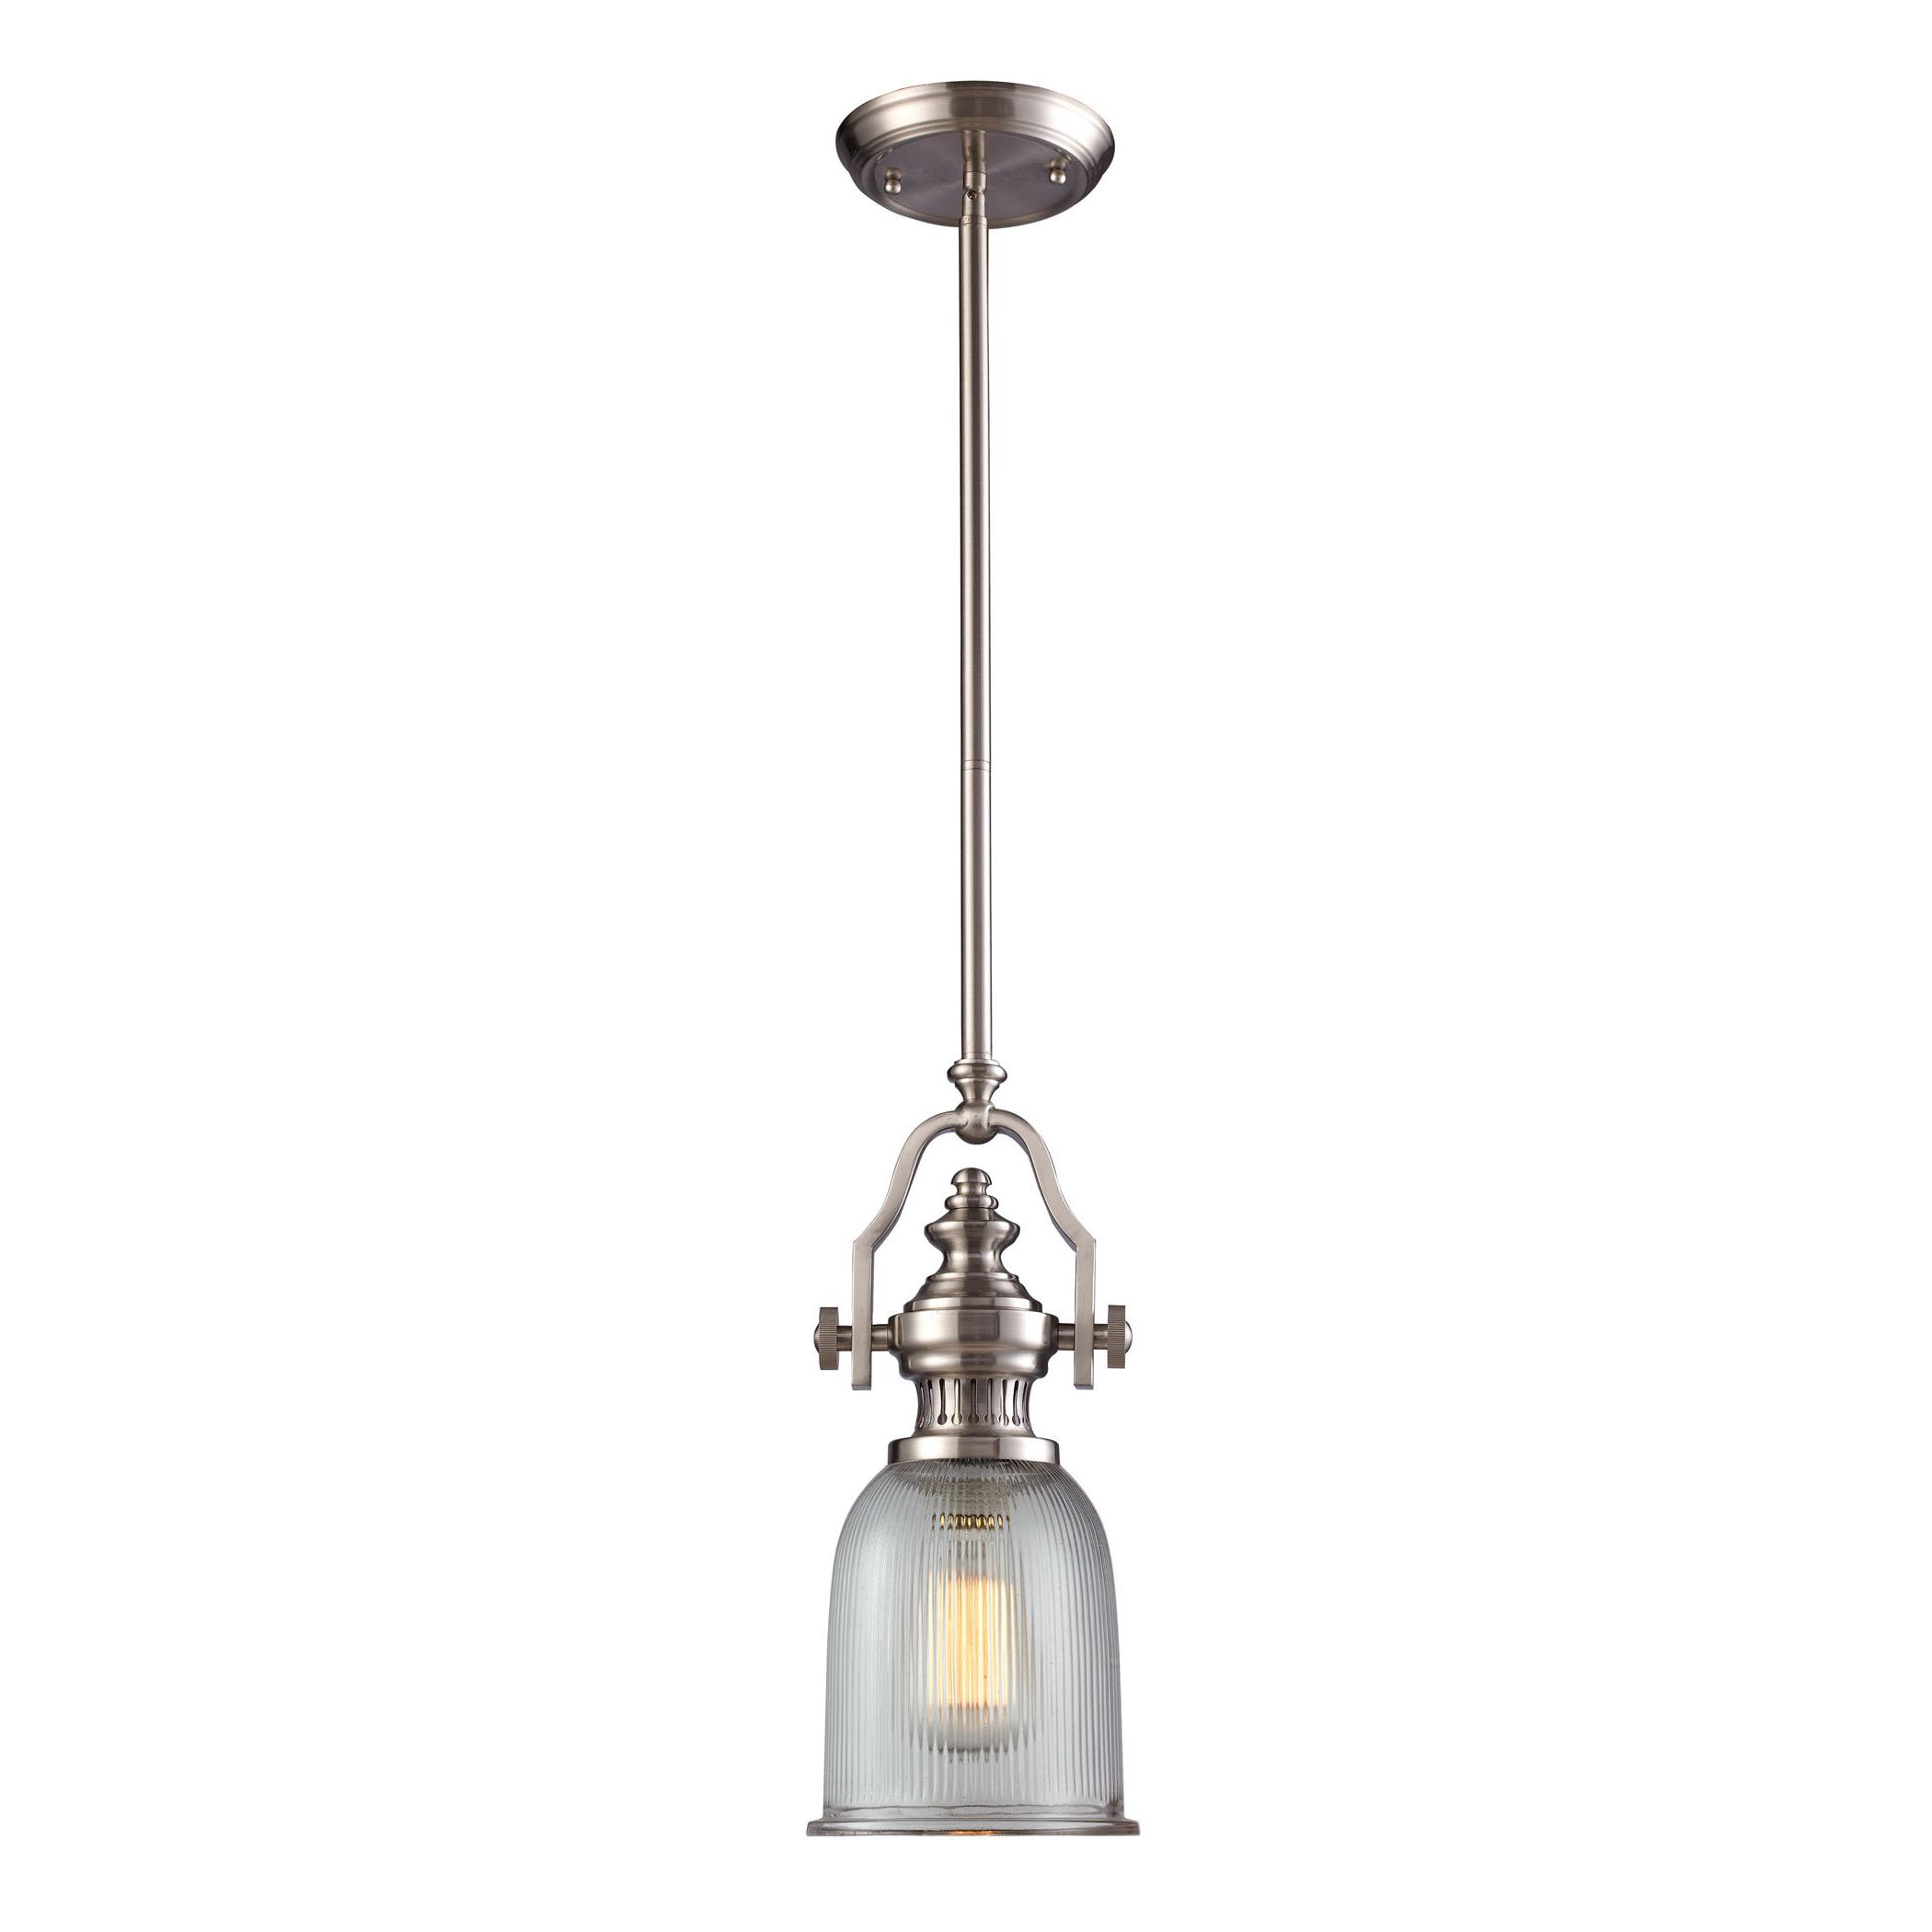 Famous Erico 1 Light Single Bell Pendants Pertaining To Erico 1 Light Single Bell Pendant (View 3 of 20)